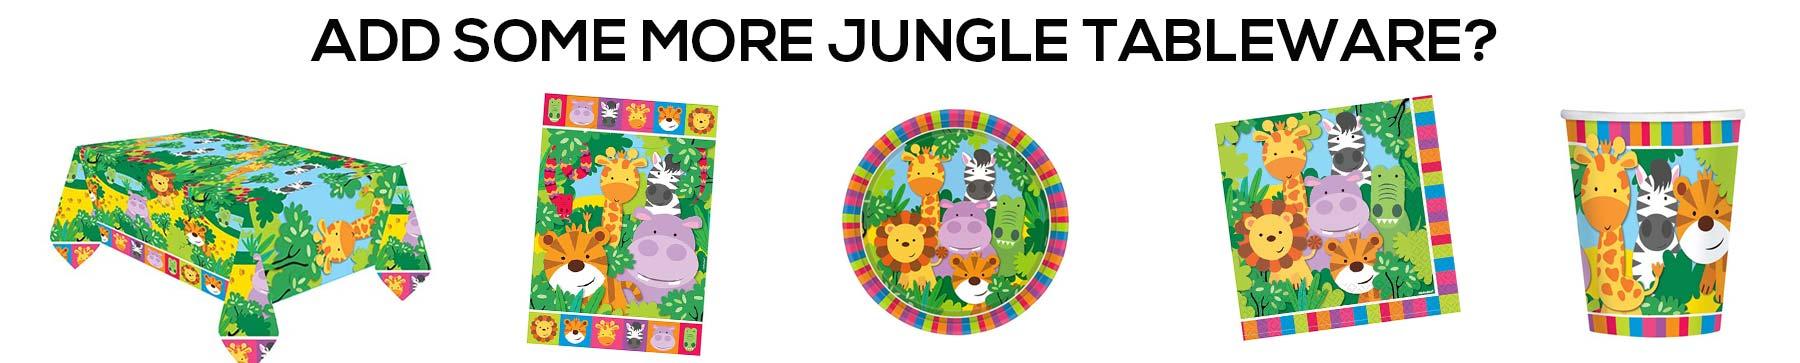 kids jungle safari birthday tableware